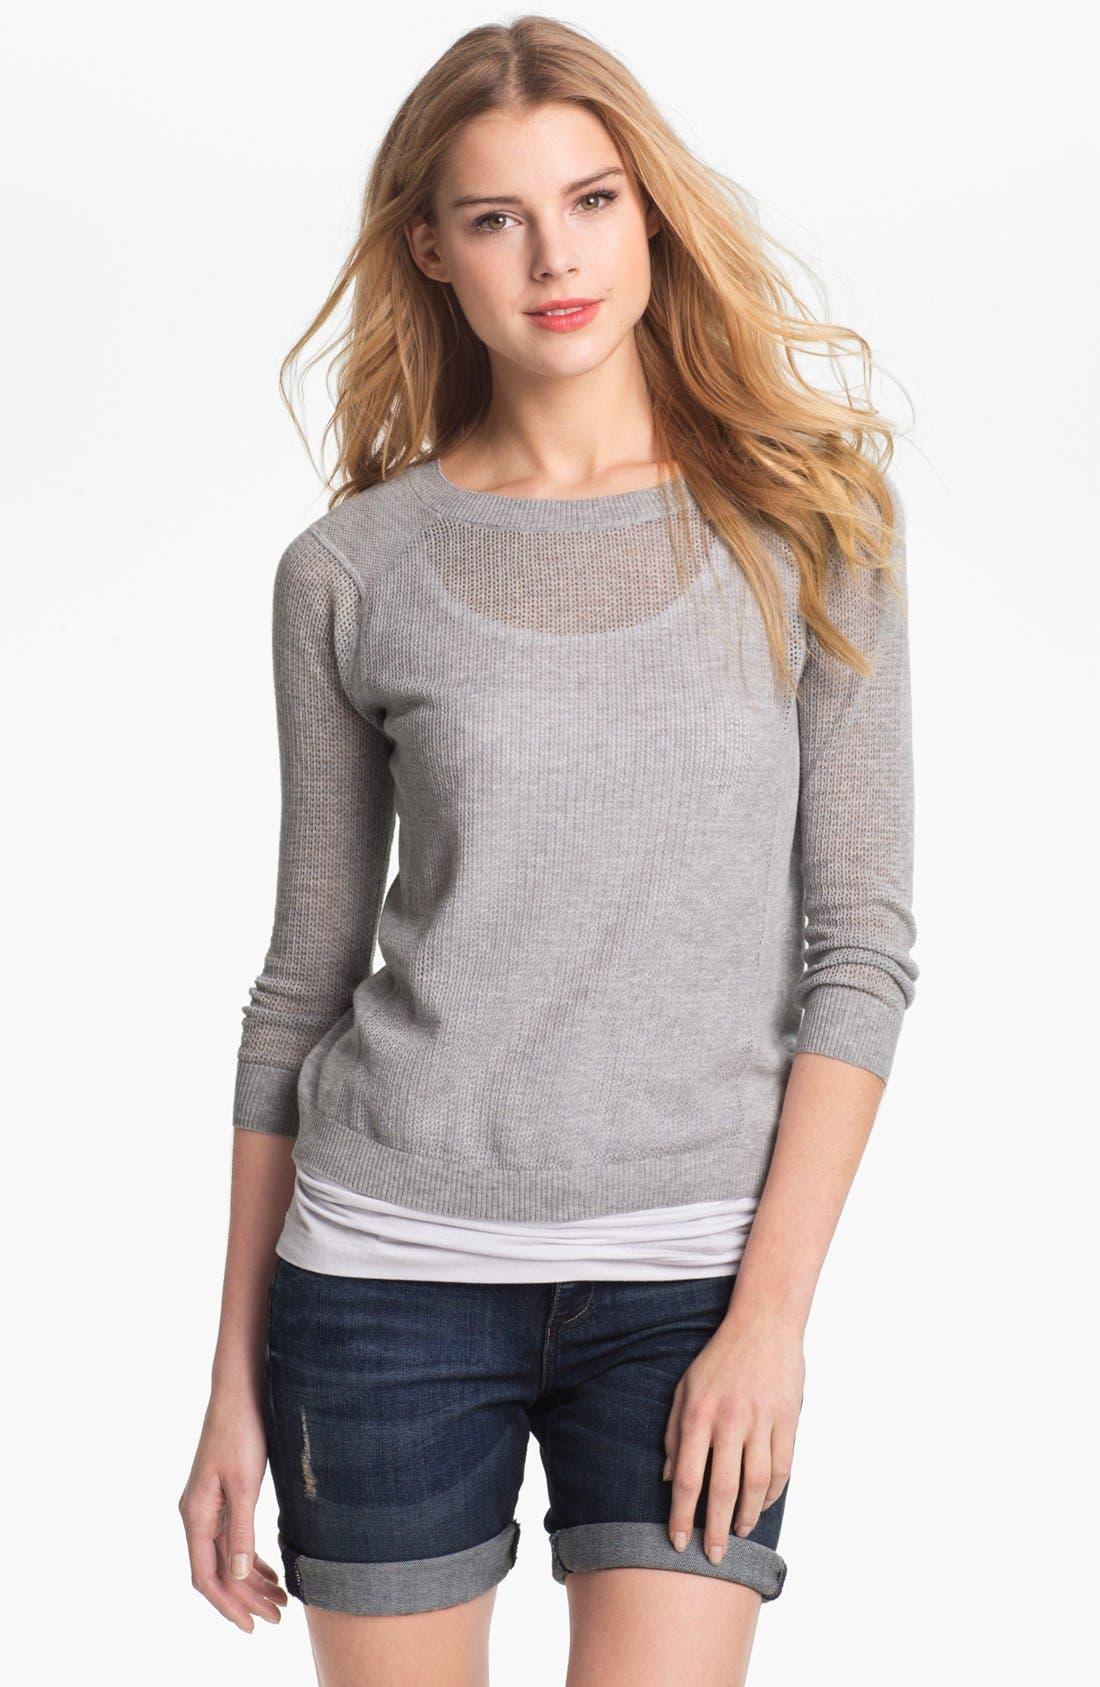 Alternate Image 1 Selected - Caslon® Three Quarter Sleeve Textured Sweater (Petite)